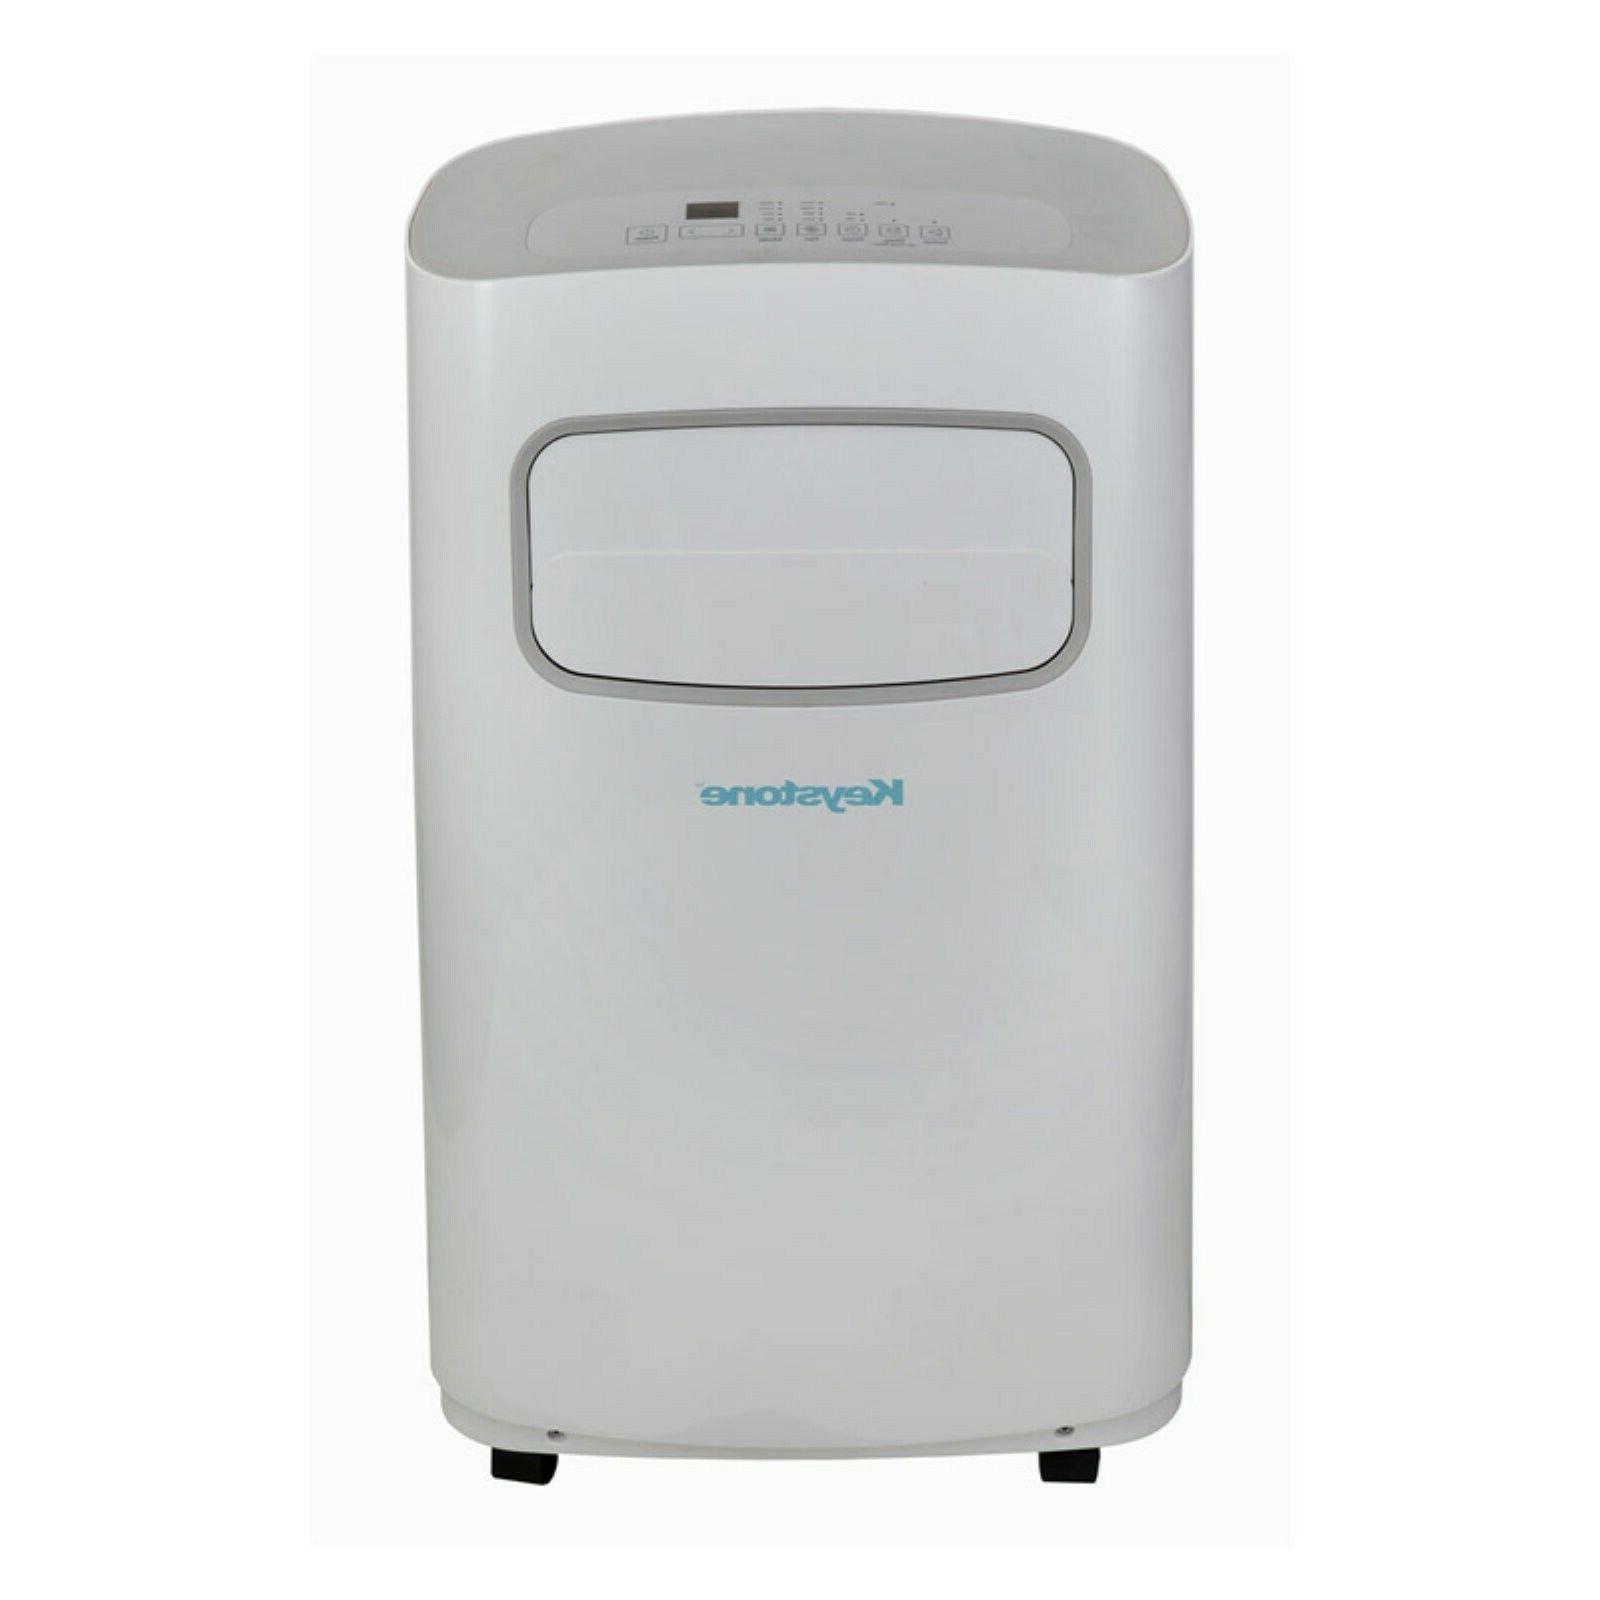 kstap12cg 12000 btu portable air conditioner